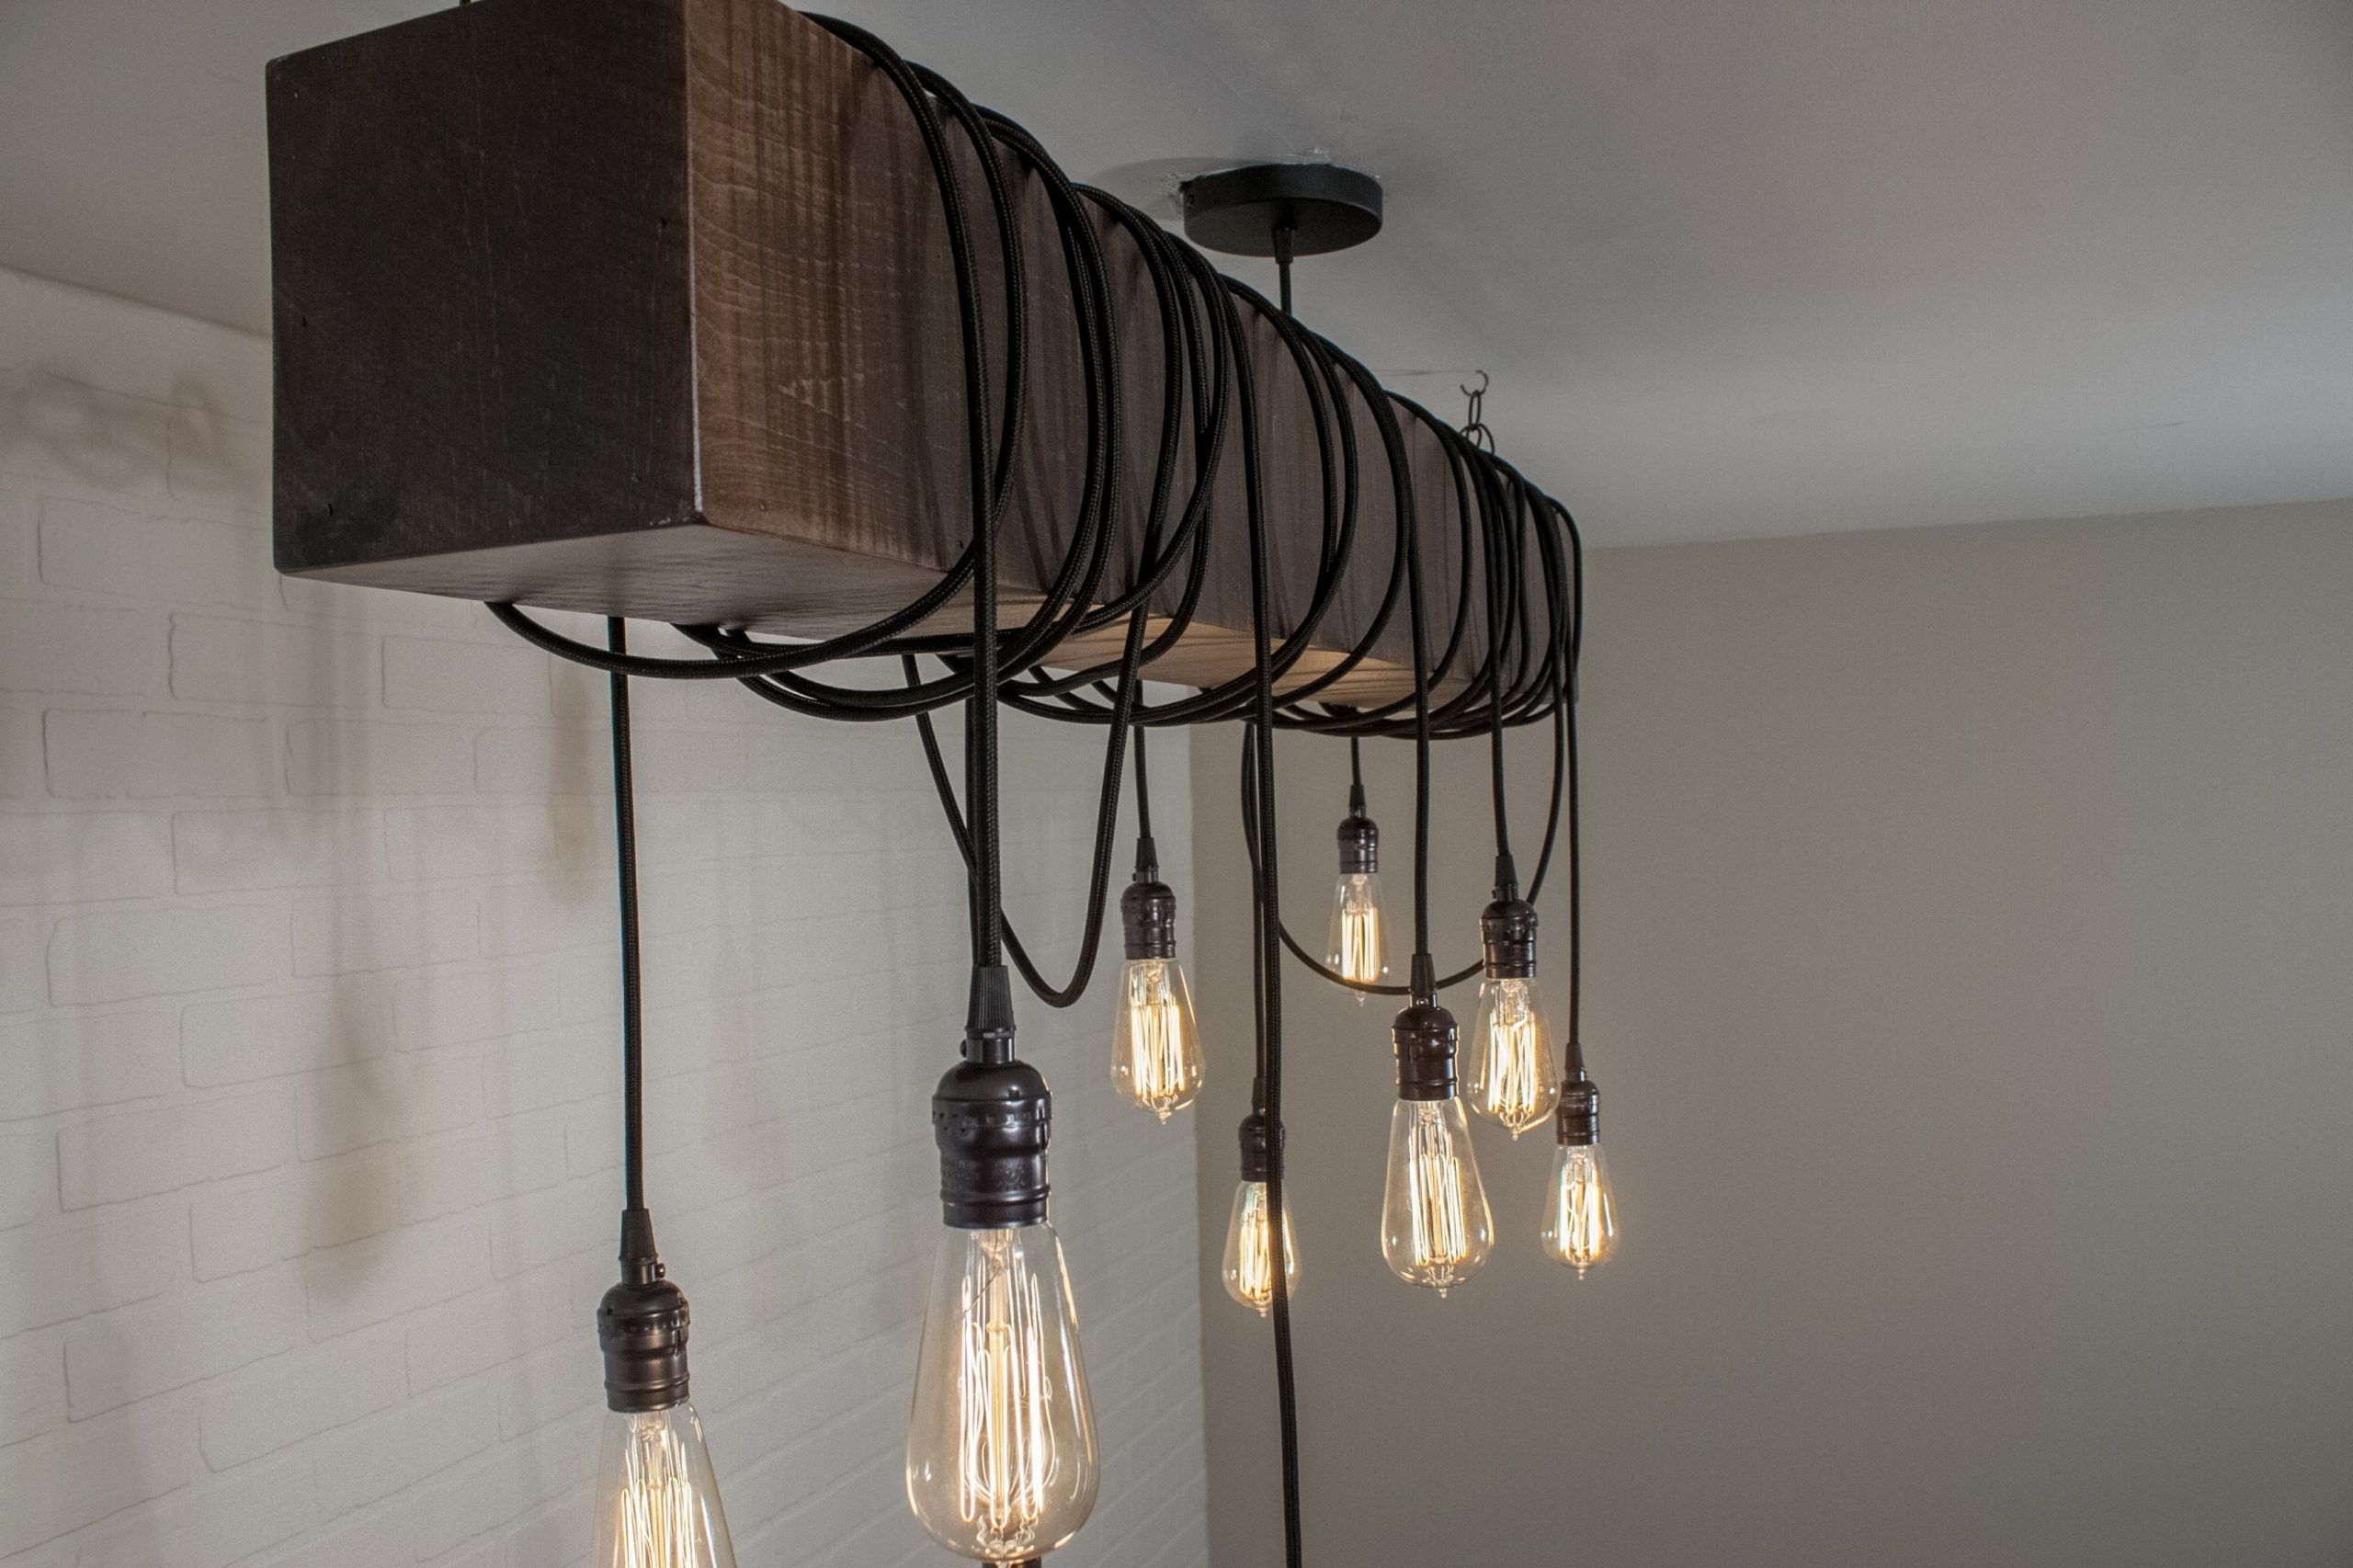 Industrial Bedroom Light Fixtures Lampu Desain Dapur Modern Dapur Rustic